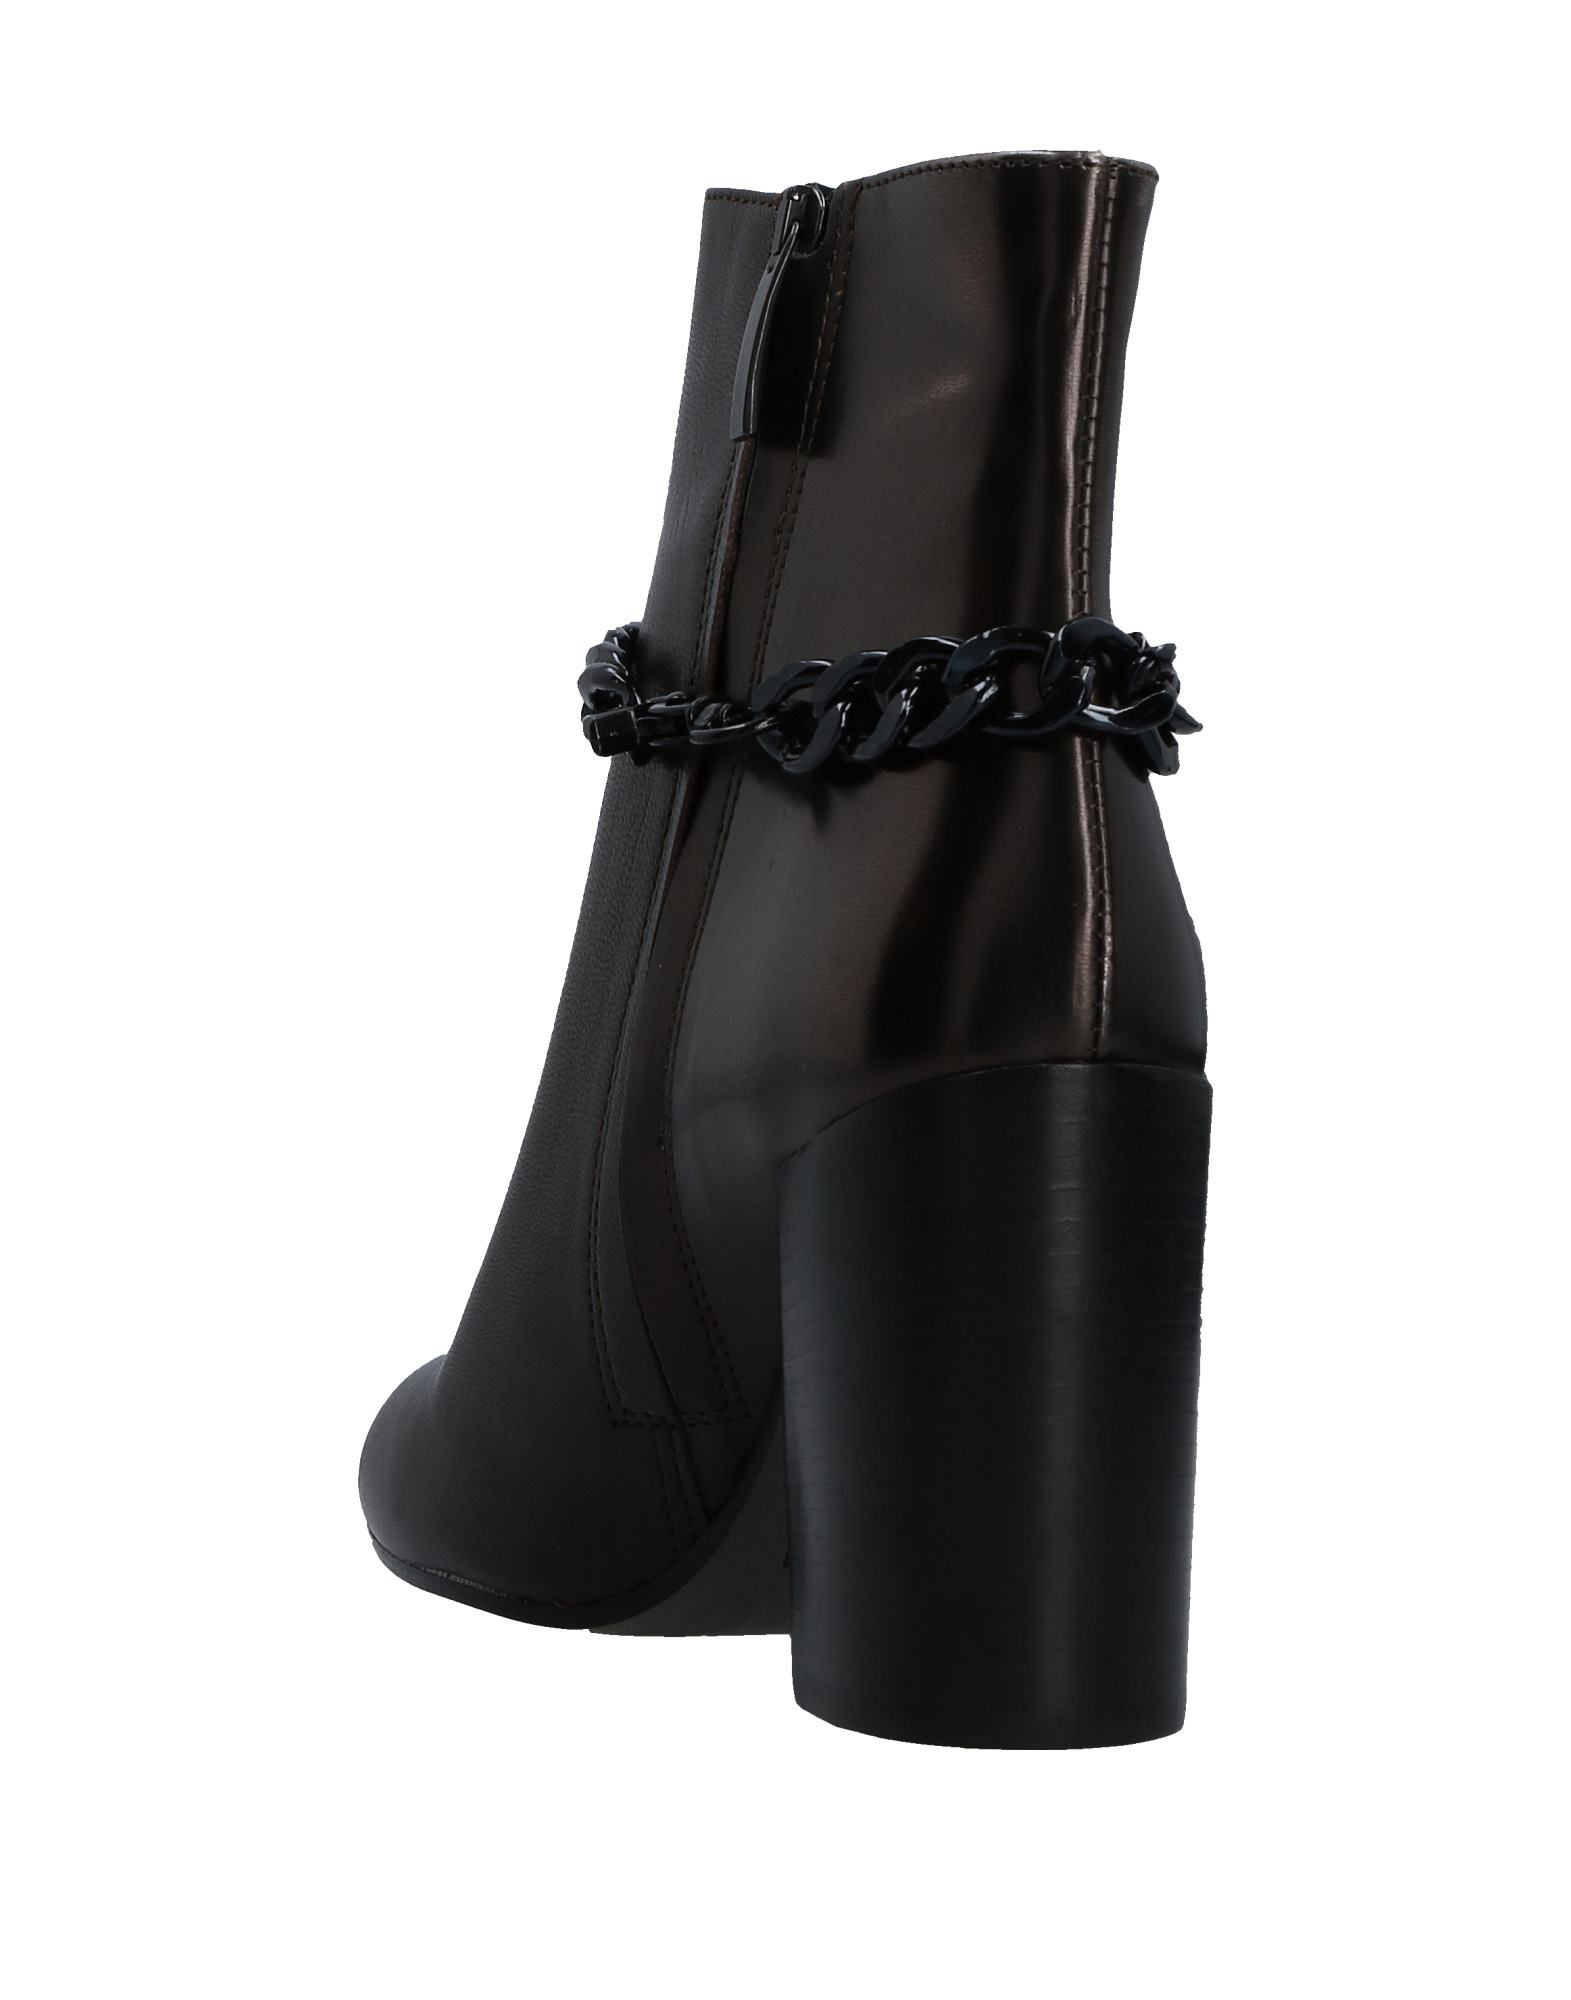 Lorenzo Mari Stiefelette Damen  11525419NK beliebte Gute Qualität beliebte 11525419NK Schuhe ac070b